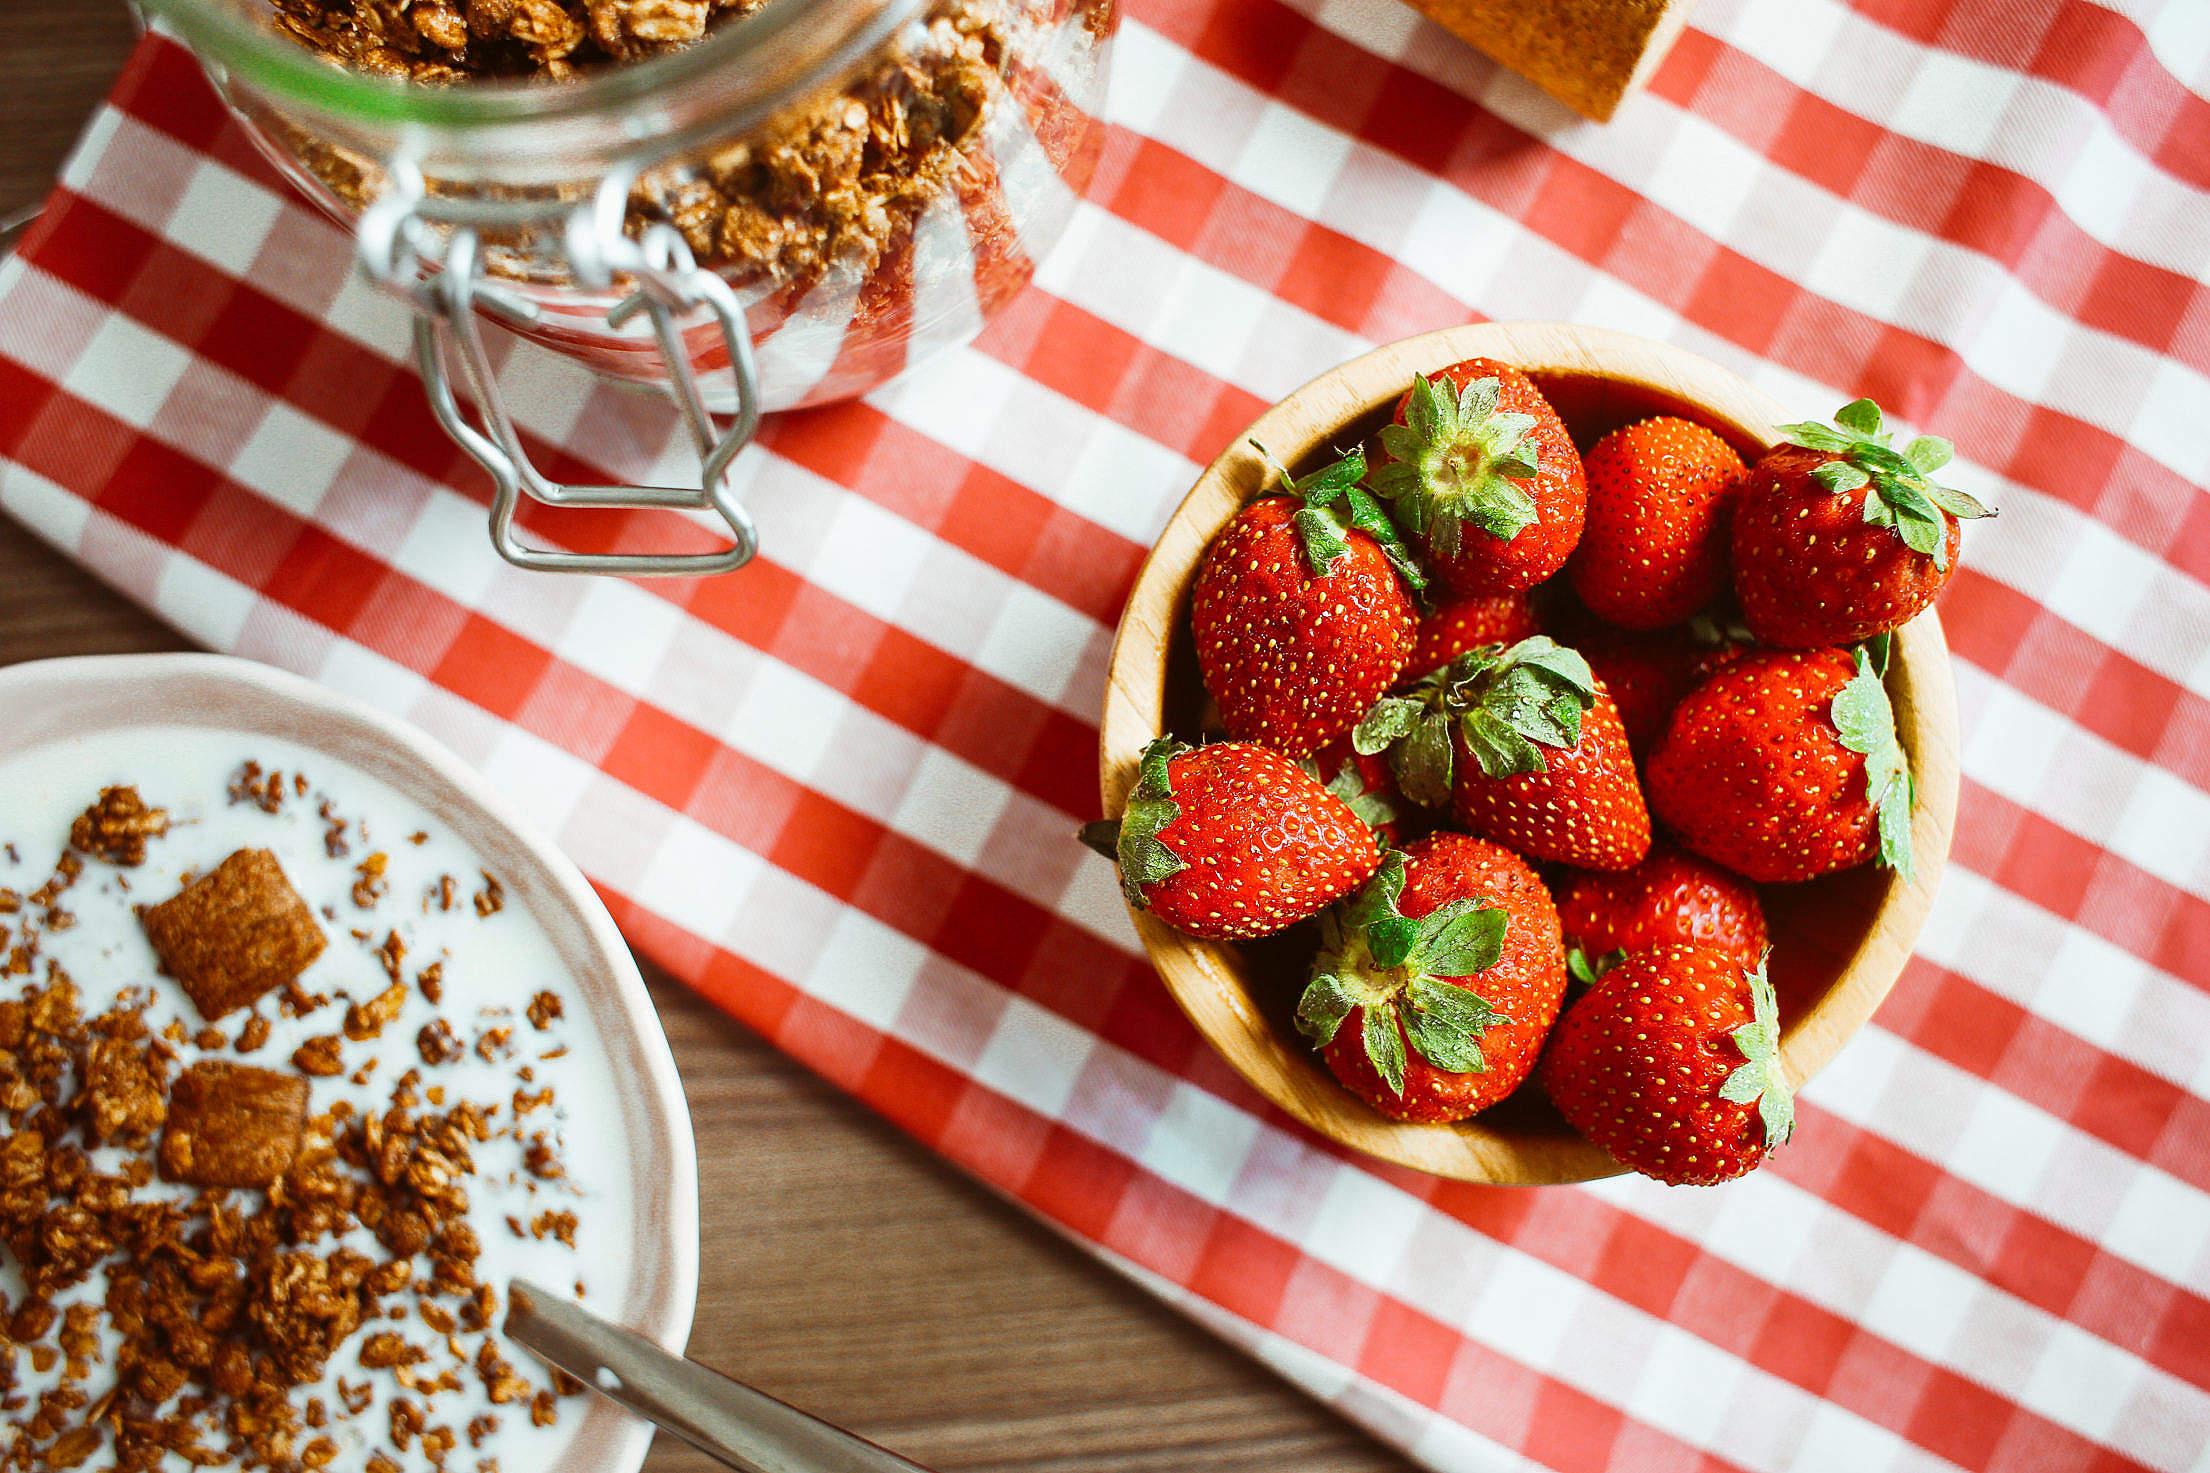 Download Fresh Strawberries Breakfast Free Stock Photo